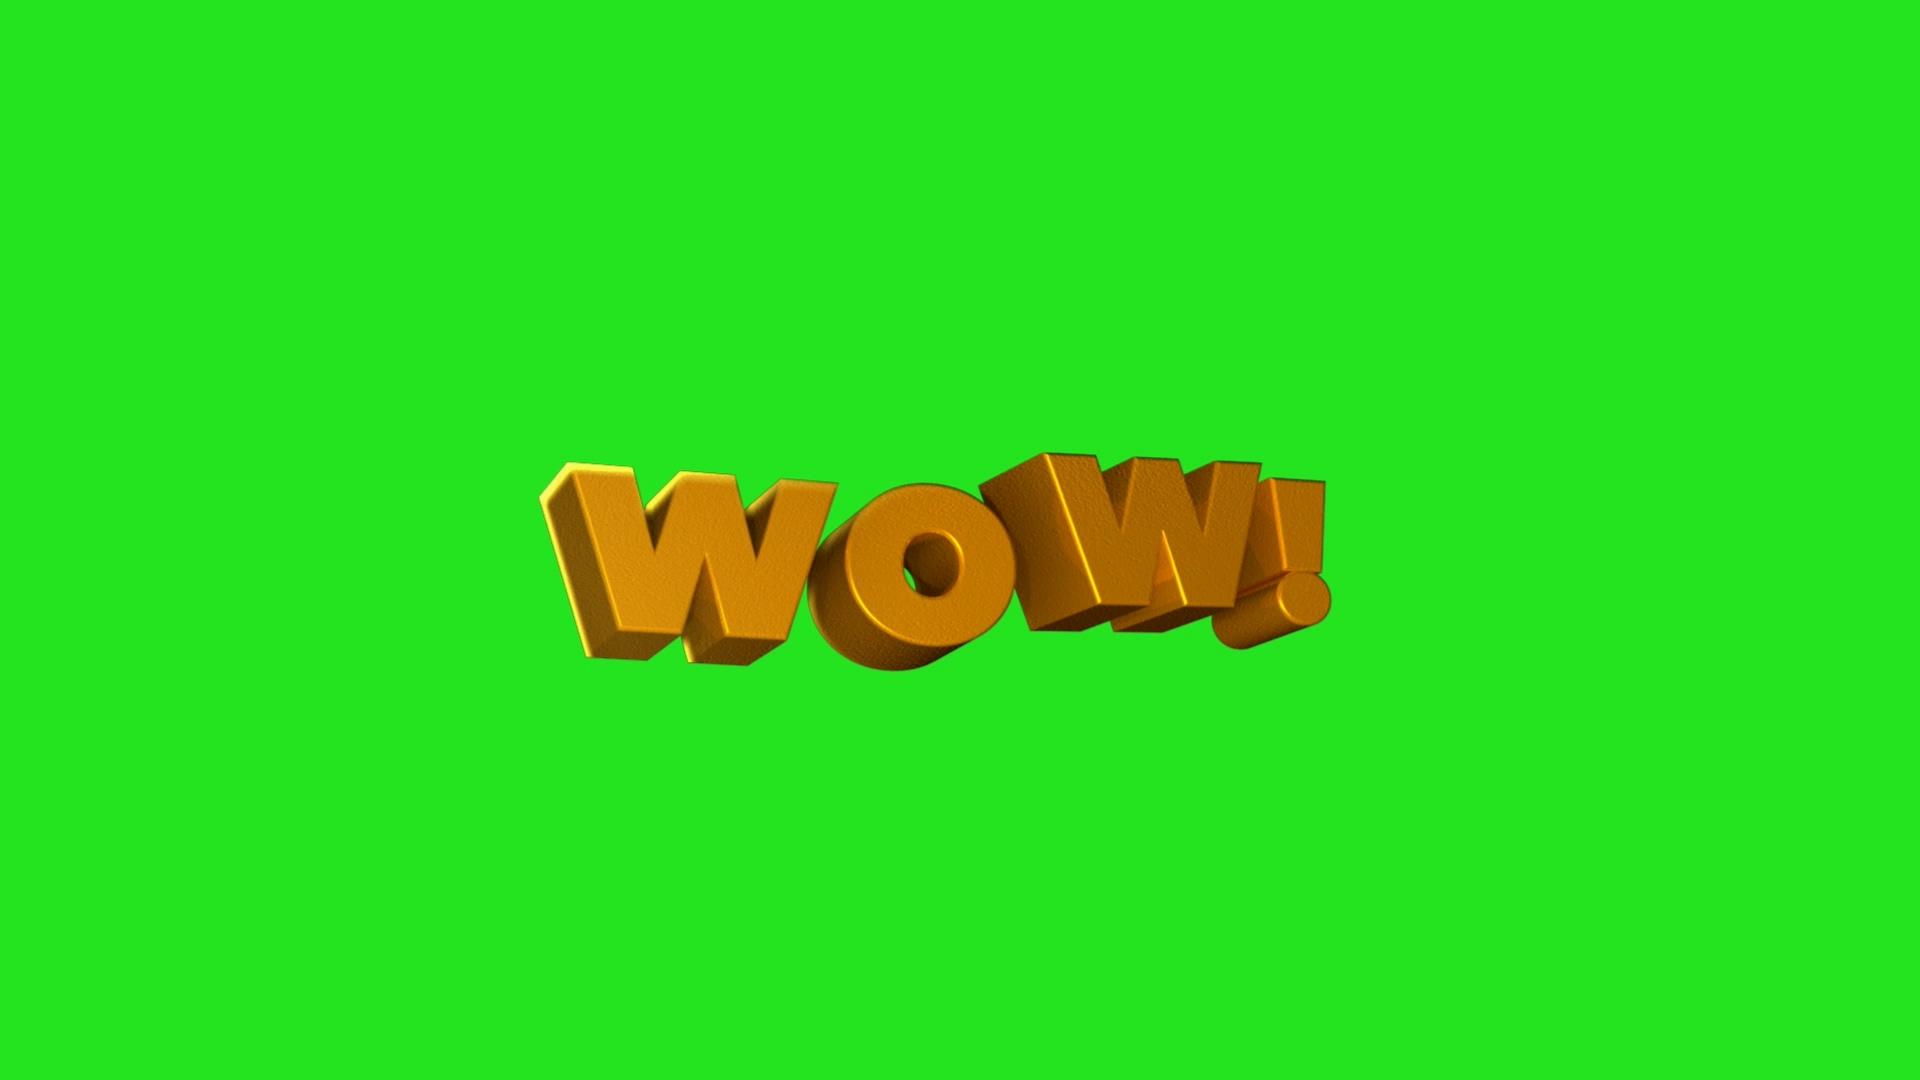 wow-amazing绿幕视频素材